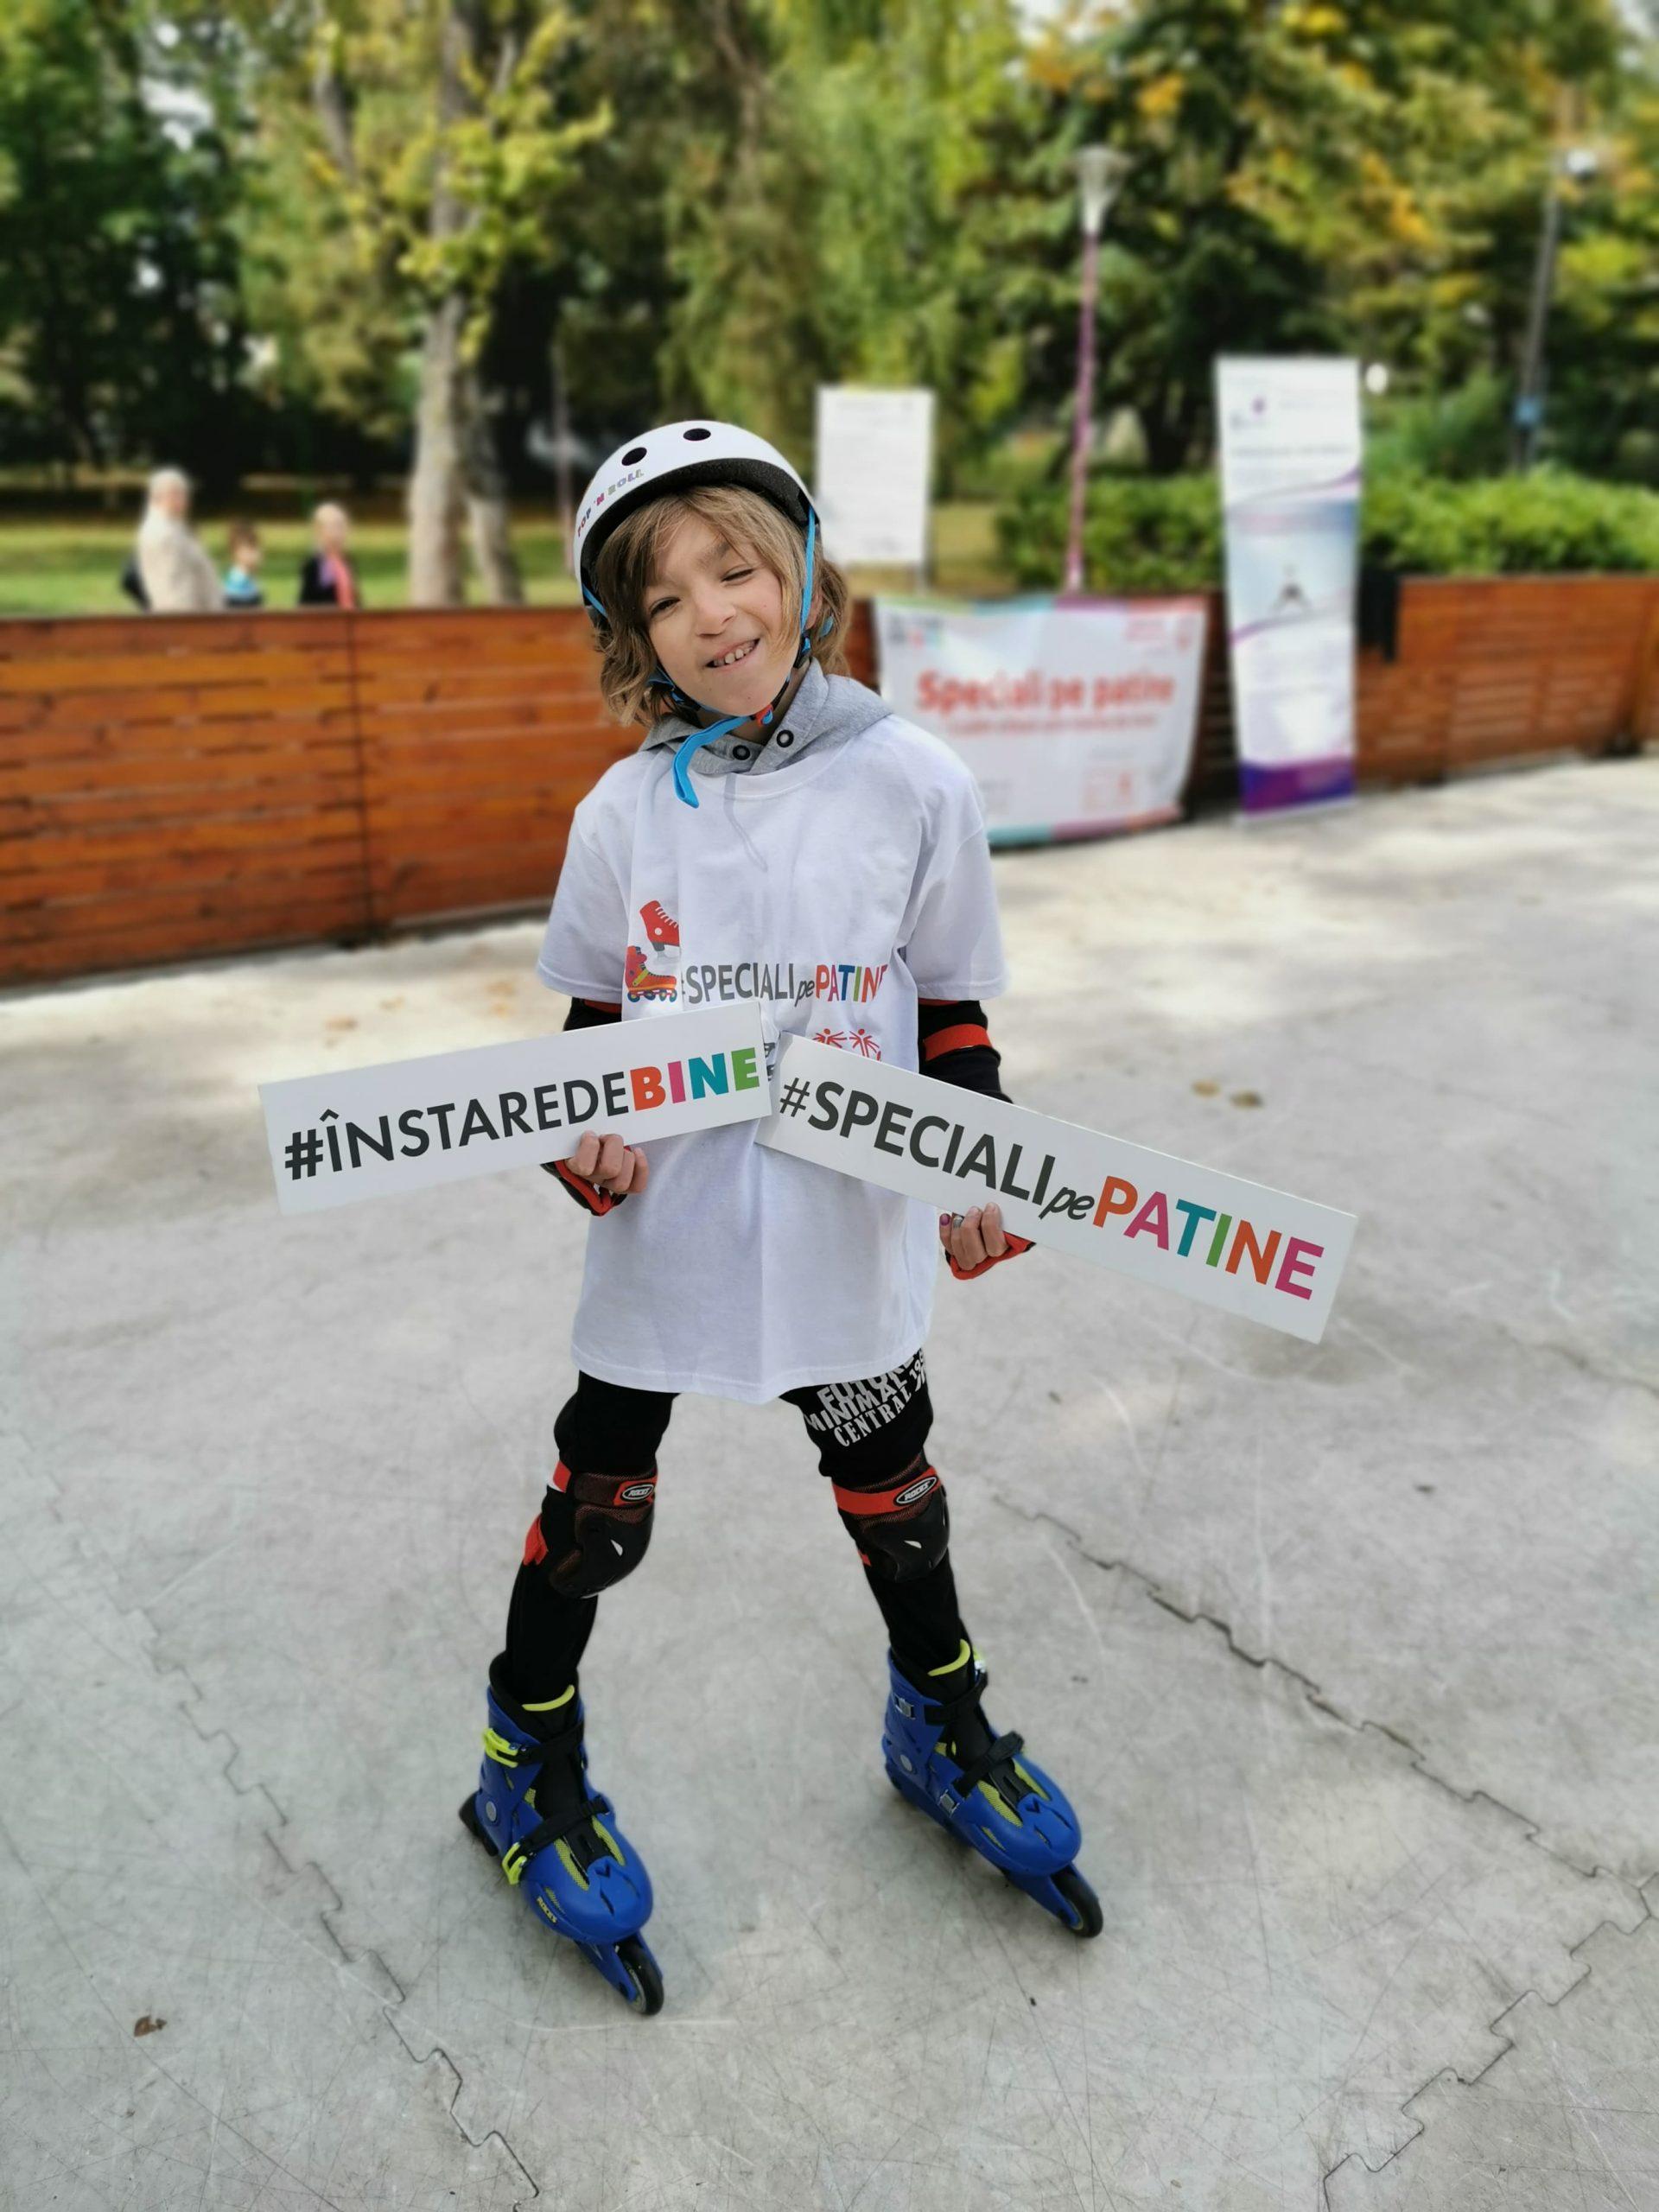 Speciali pe patine, Special Olympics, Timisoara (3)